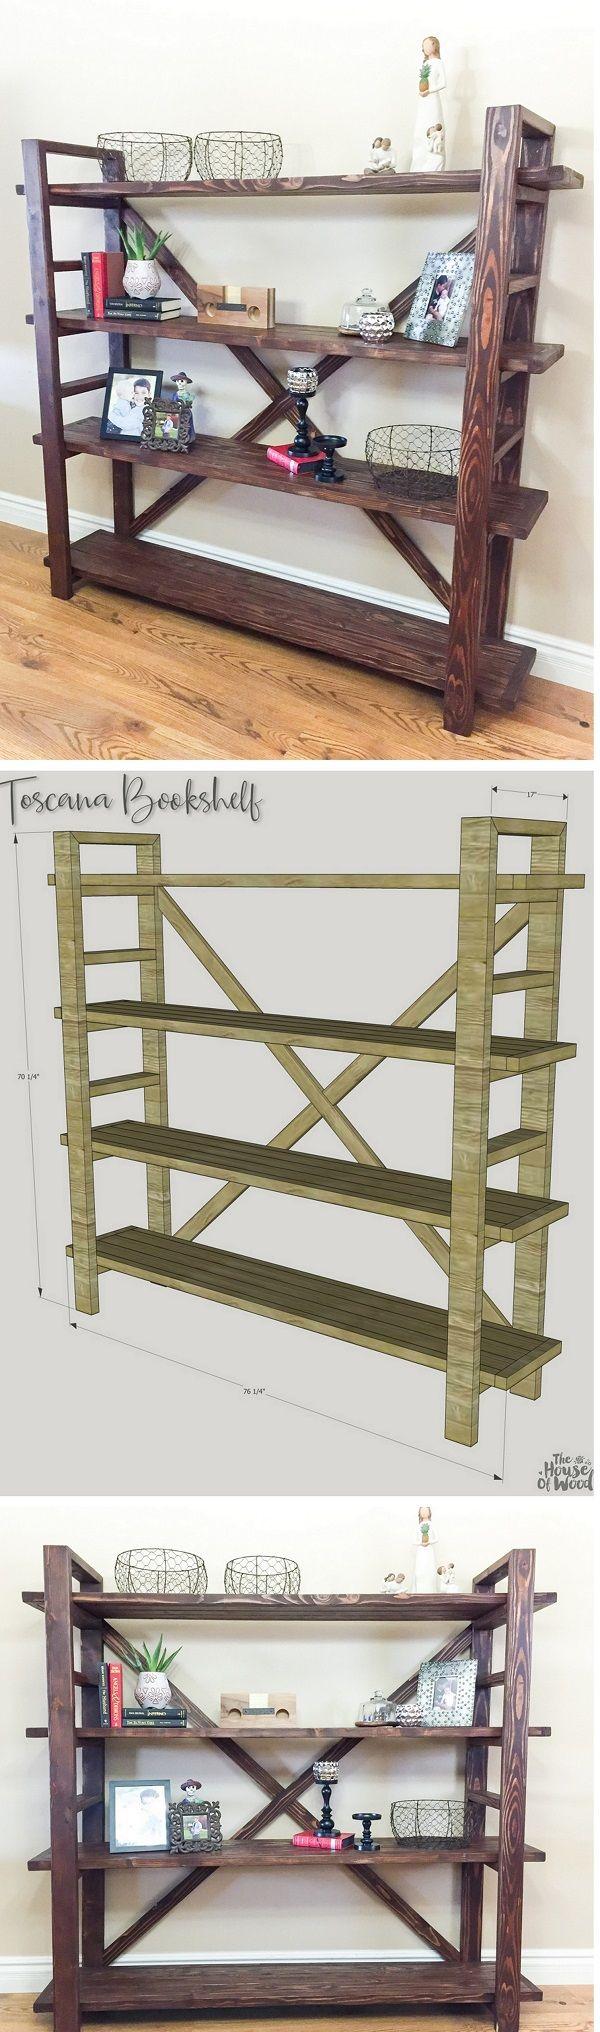 Check out how you can build a DIY Toscana bookshelf yourself @istandarddesign